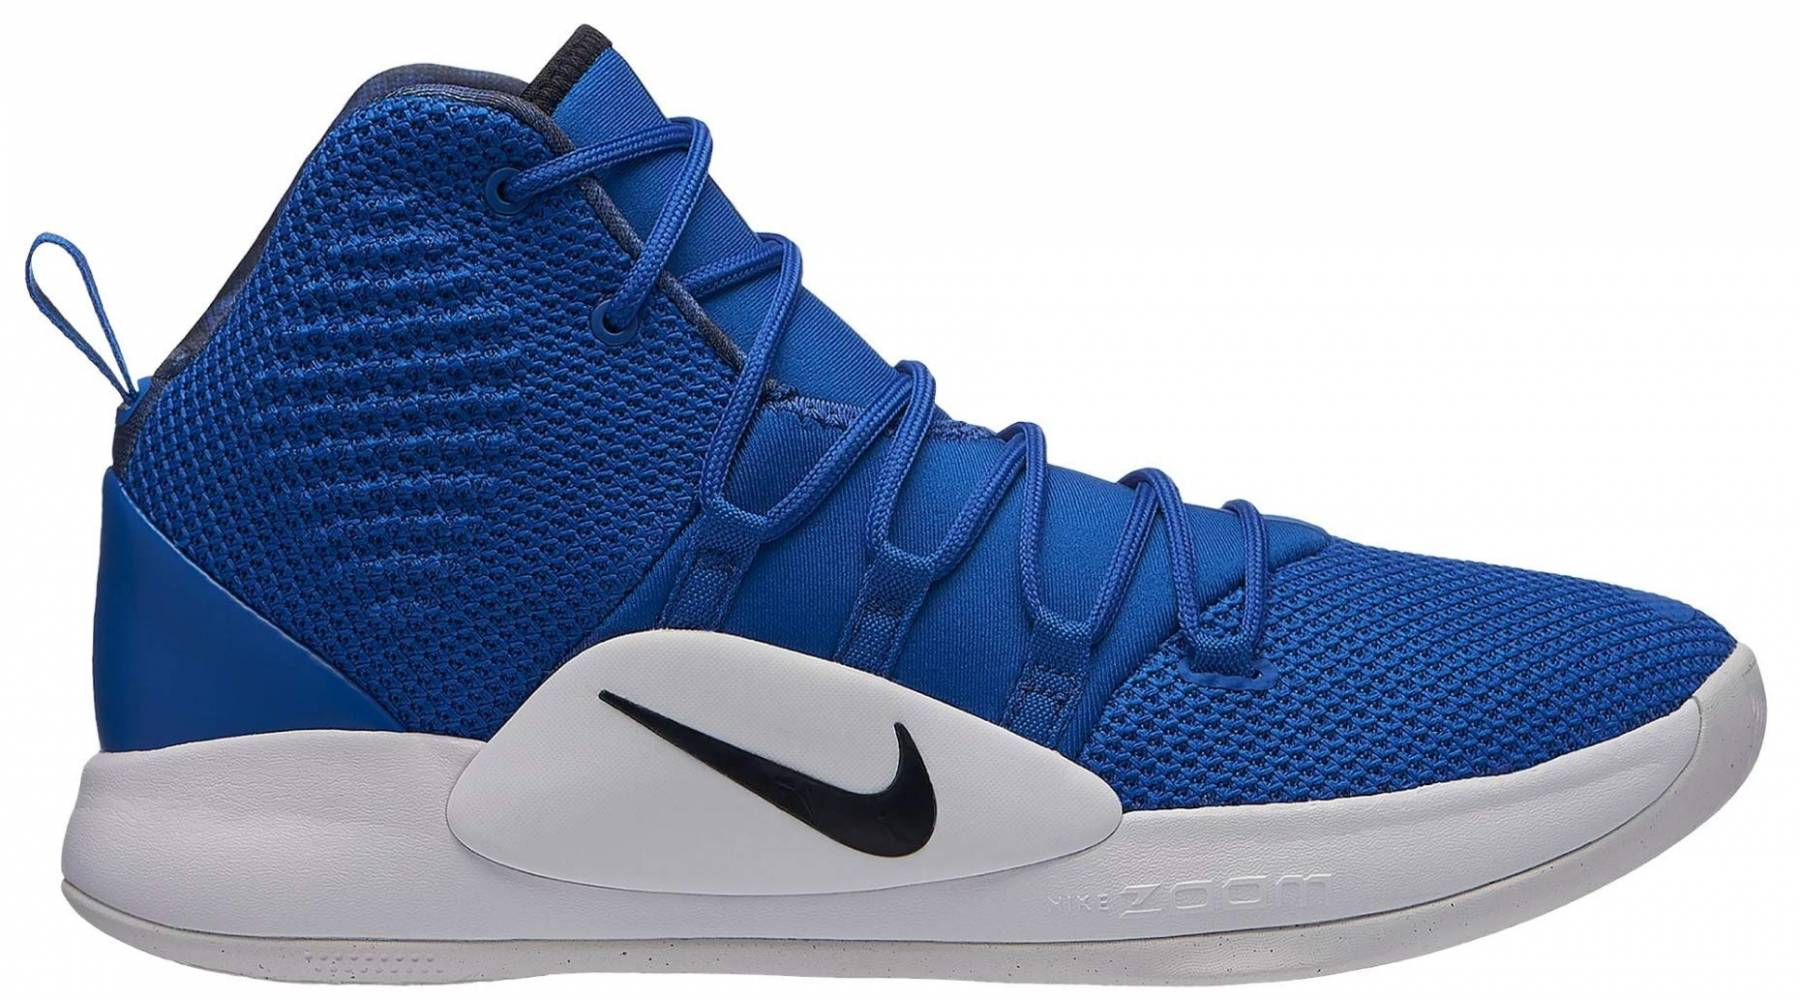 Save 31% on Blue Nike Basketball Shoes